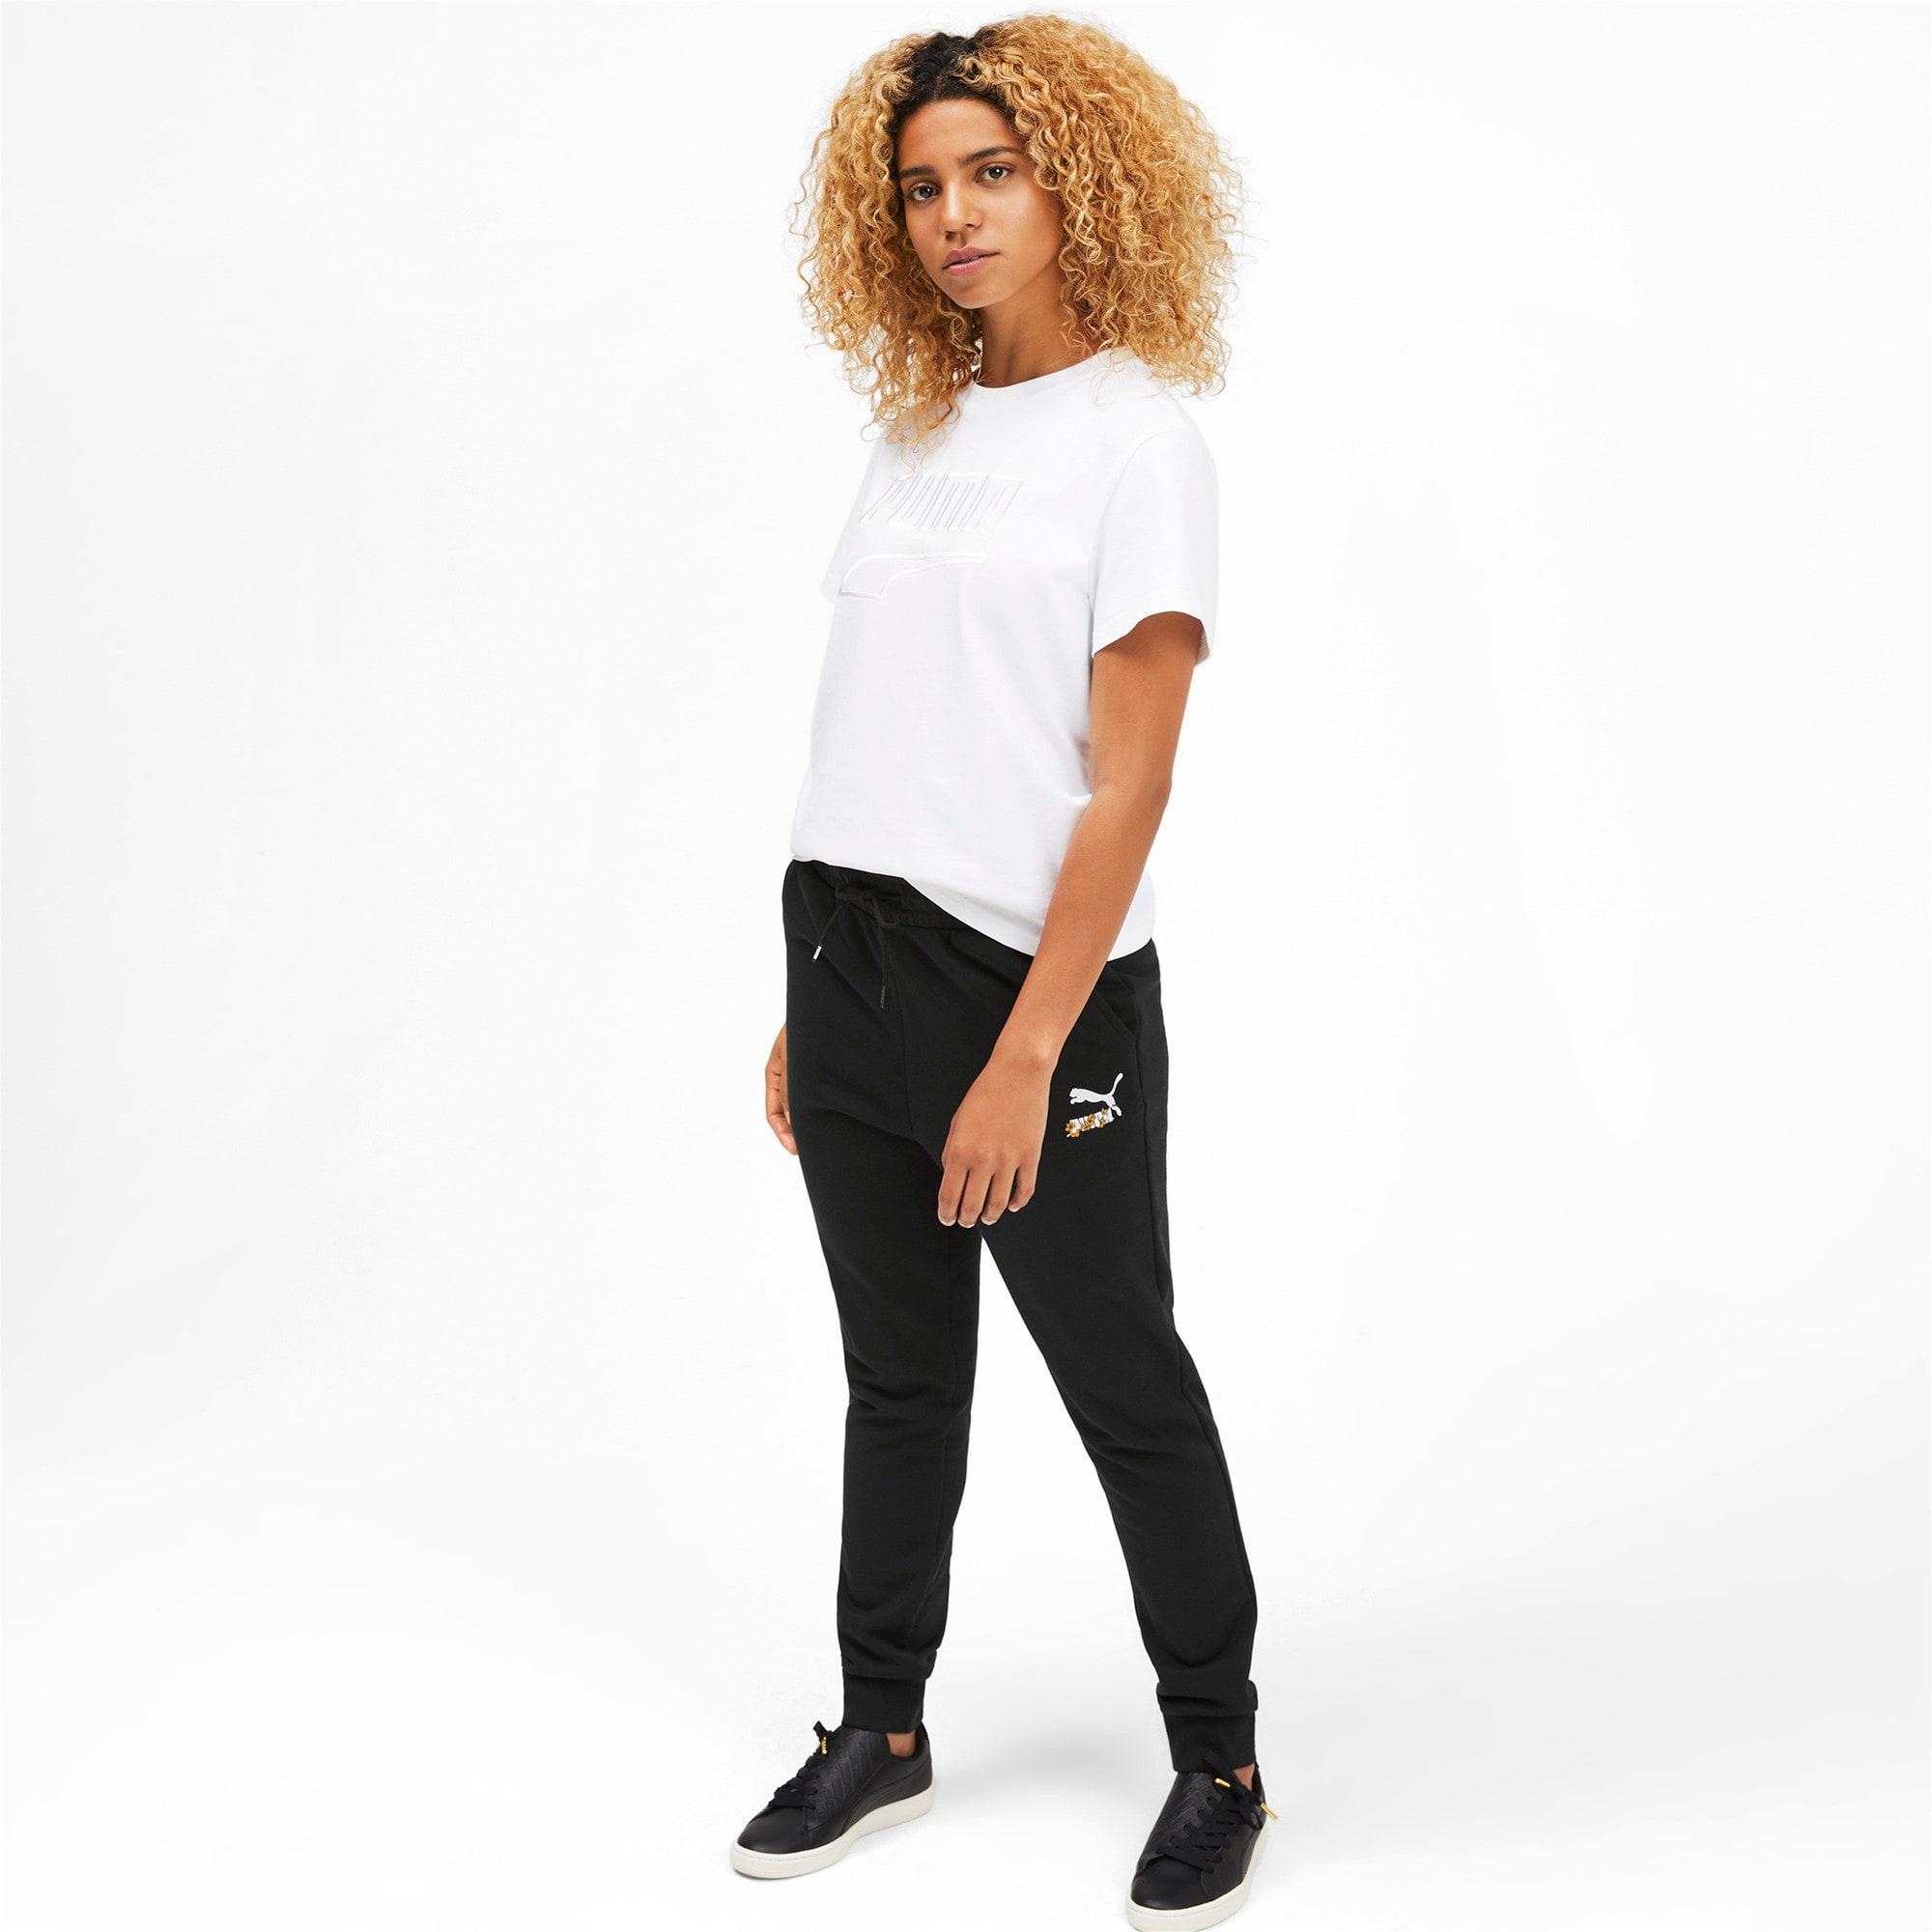 Miniatura 4 de Pantalones deportivosSakurapara mujer, Puma Black, mediano